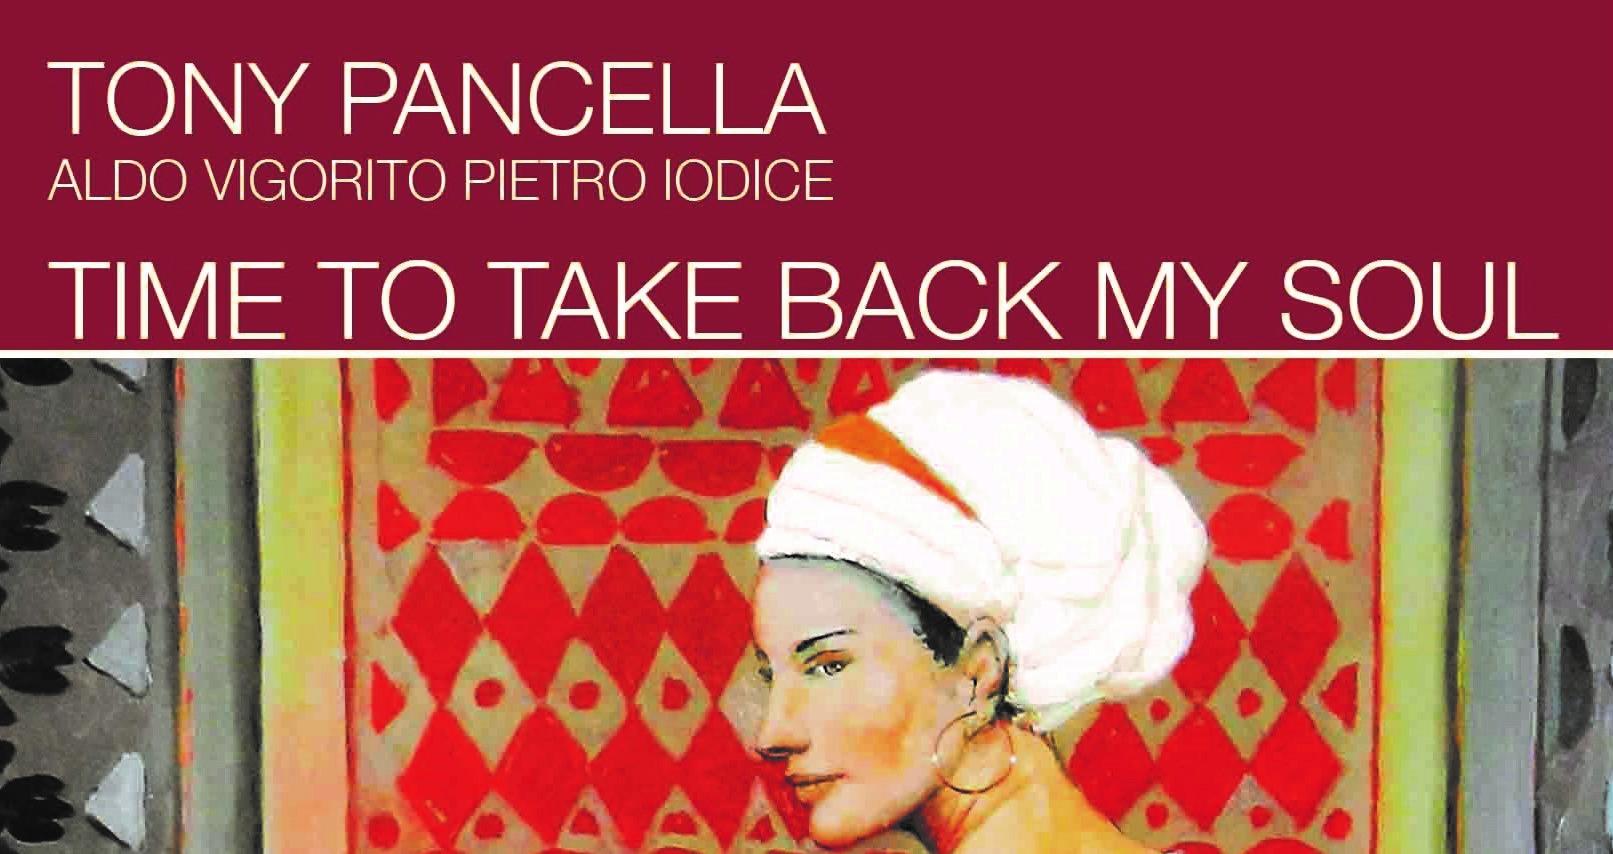 Tony Pancella